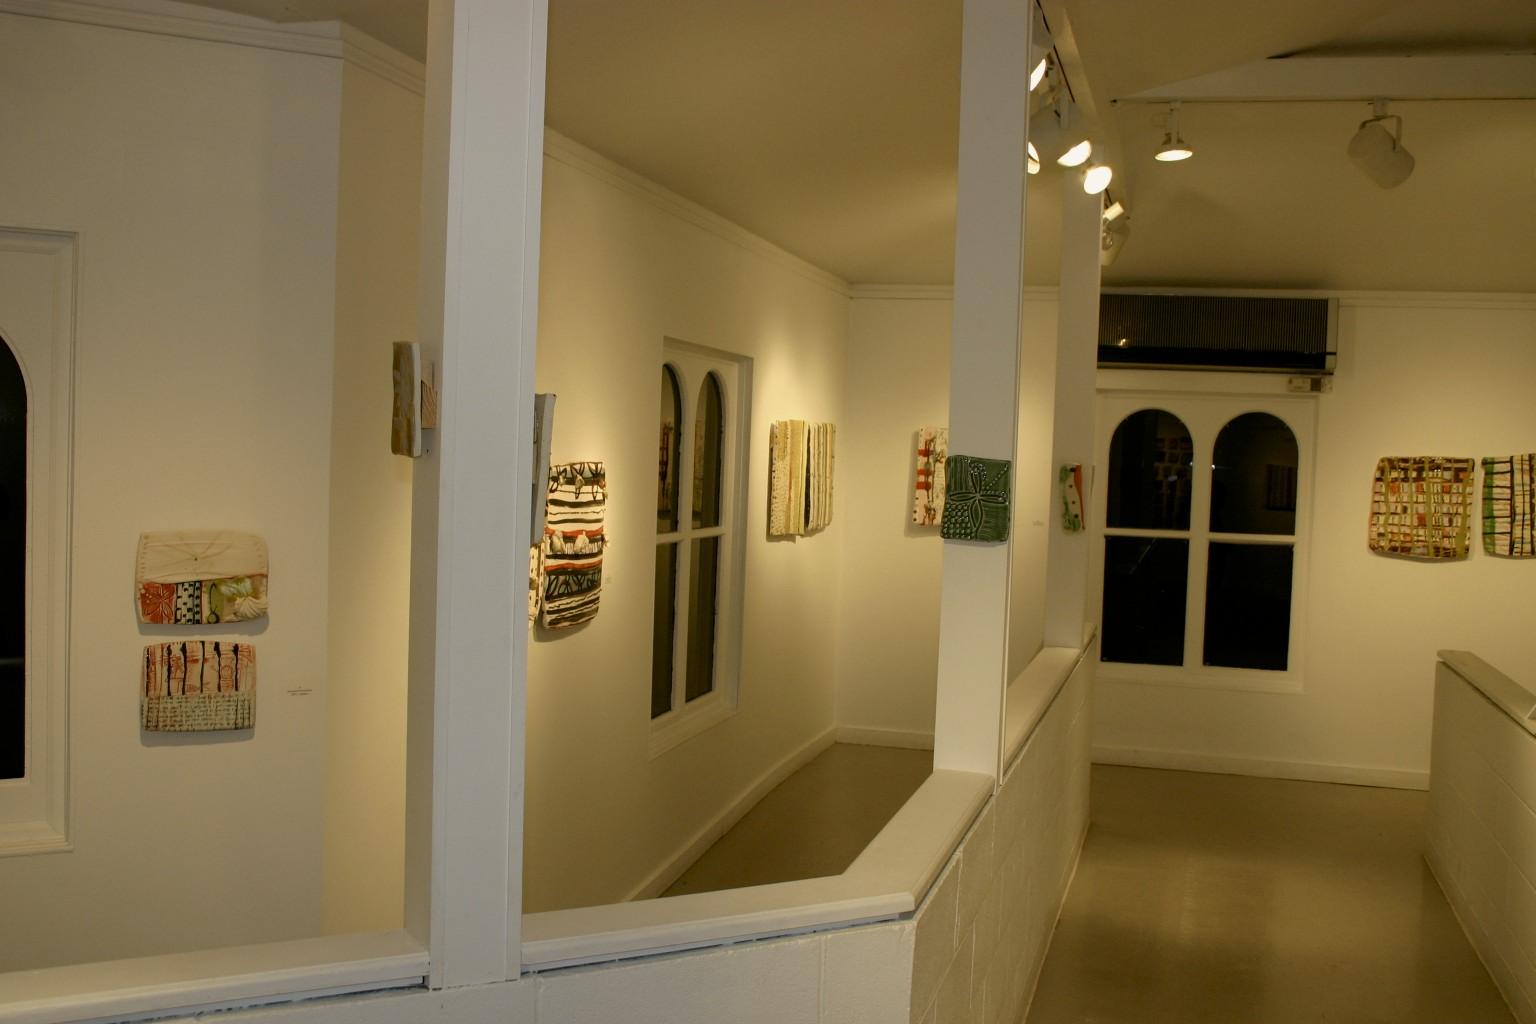 gallery, installation view